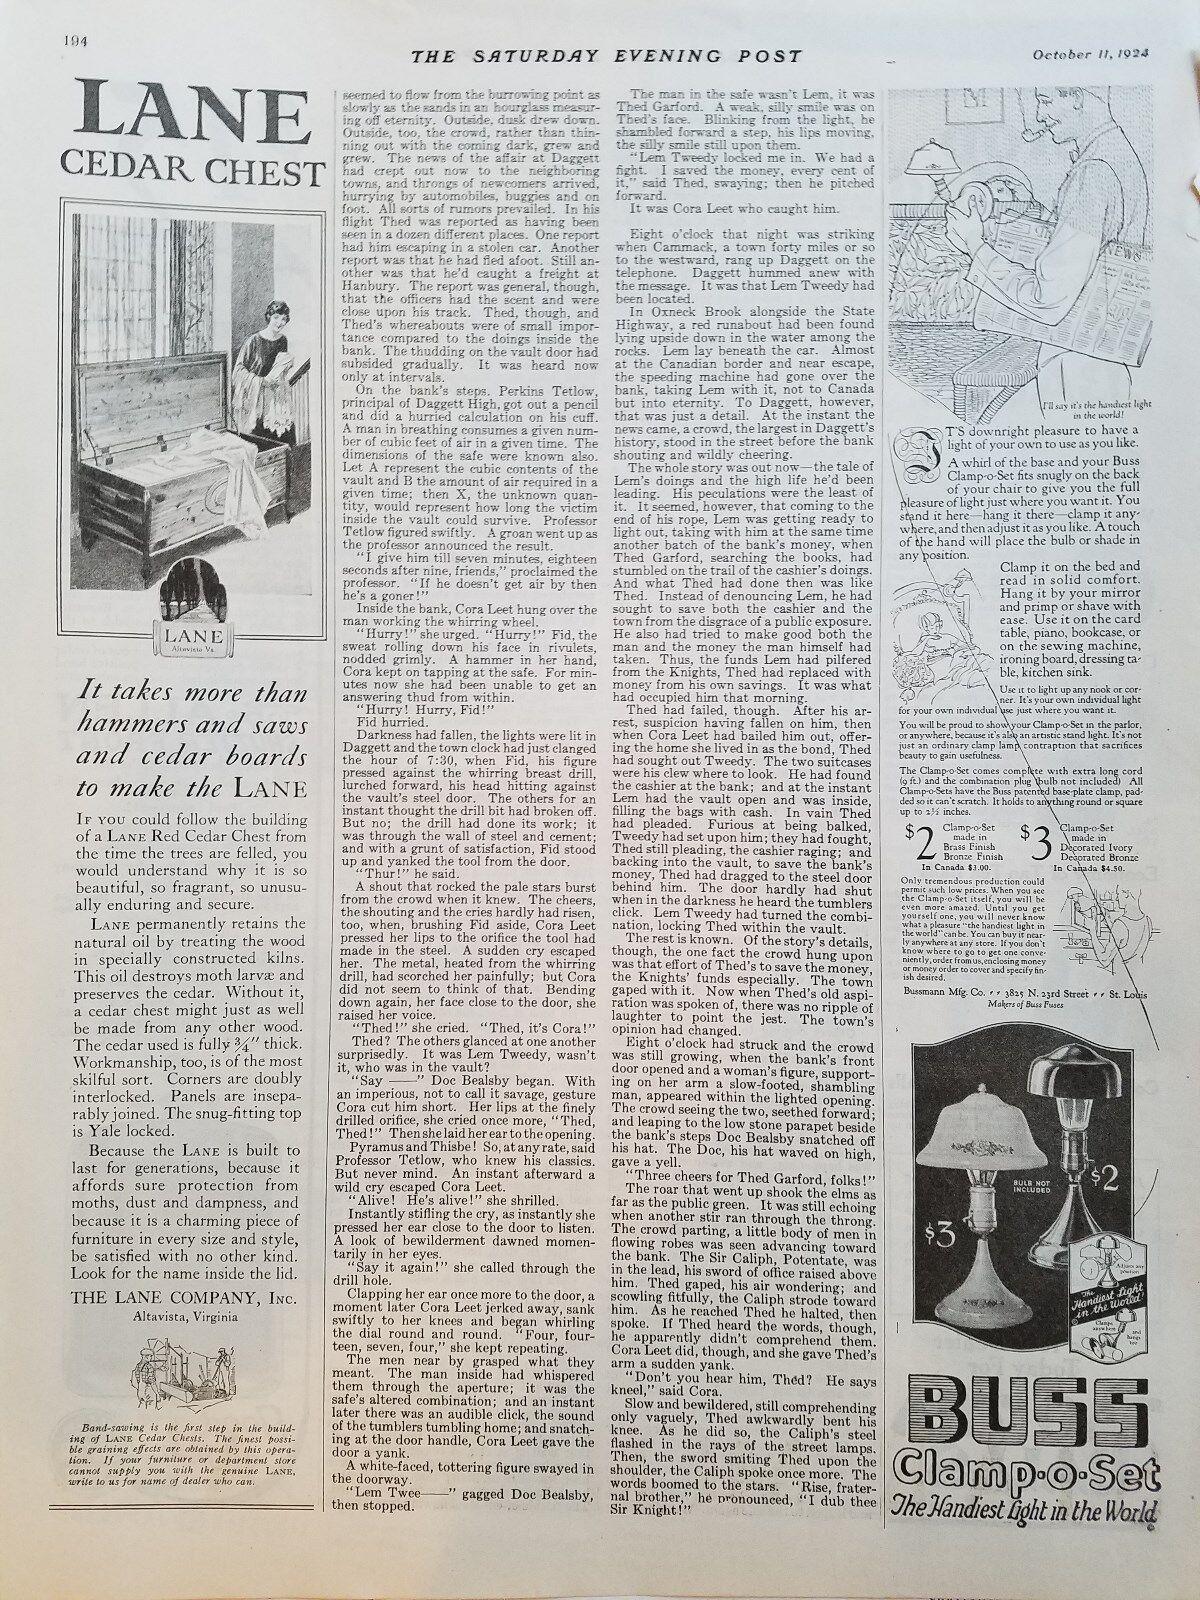 1924 Lane Cedar Chest Furniture More Than Hammers Saws And Cedar Ad